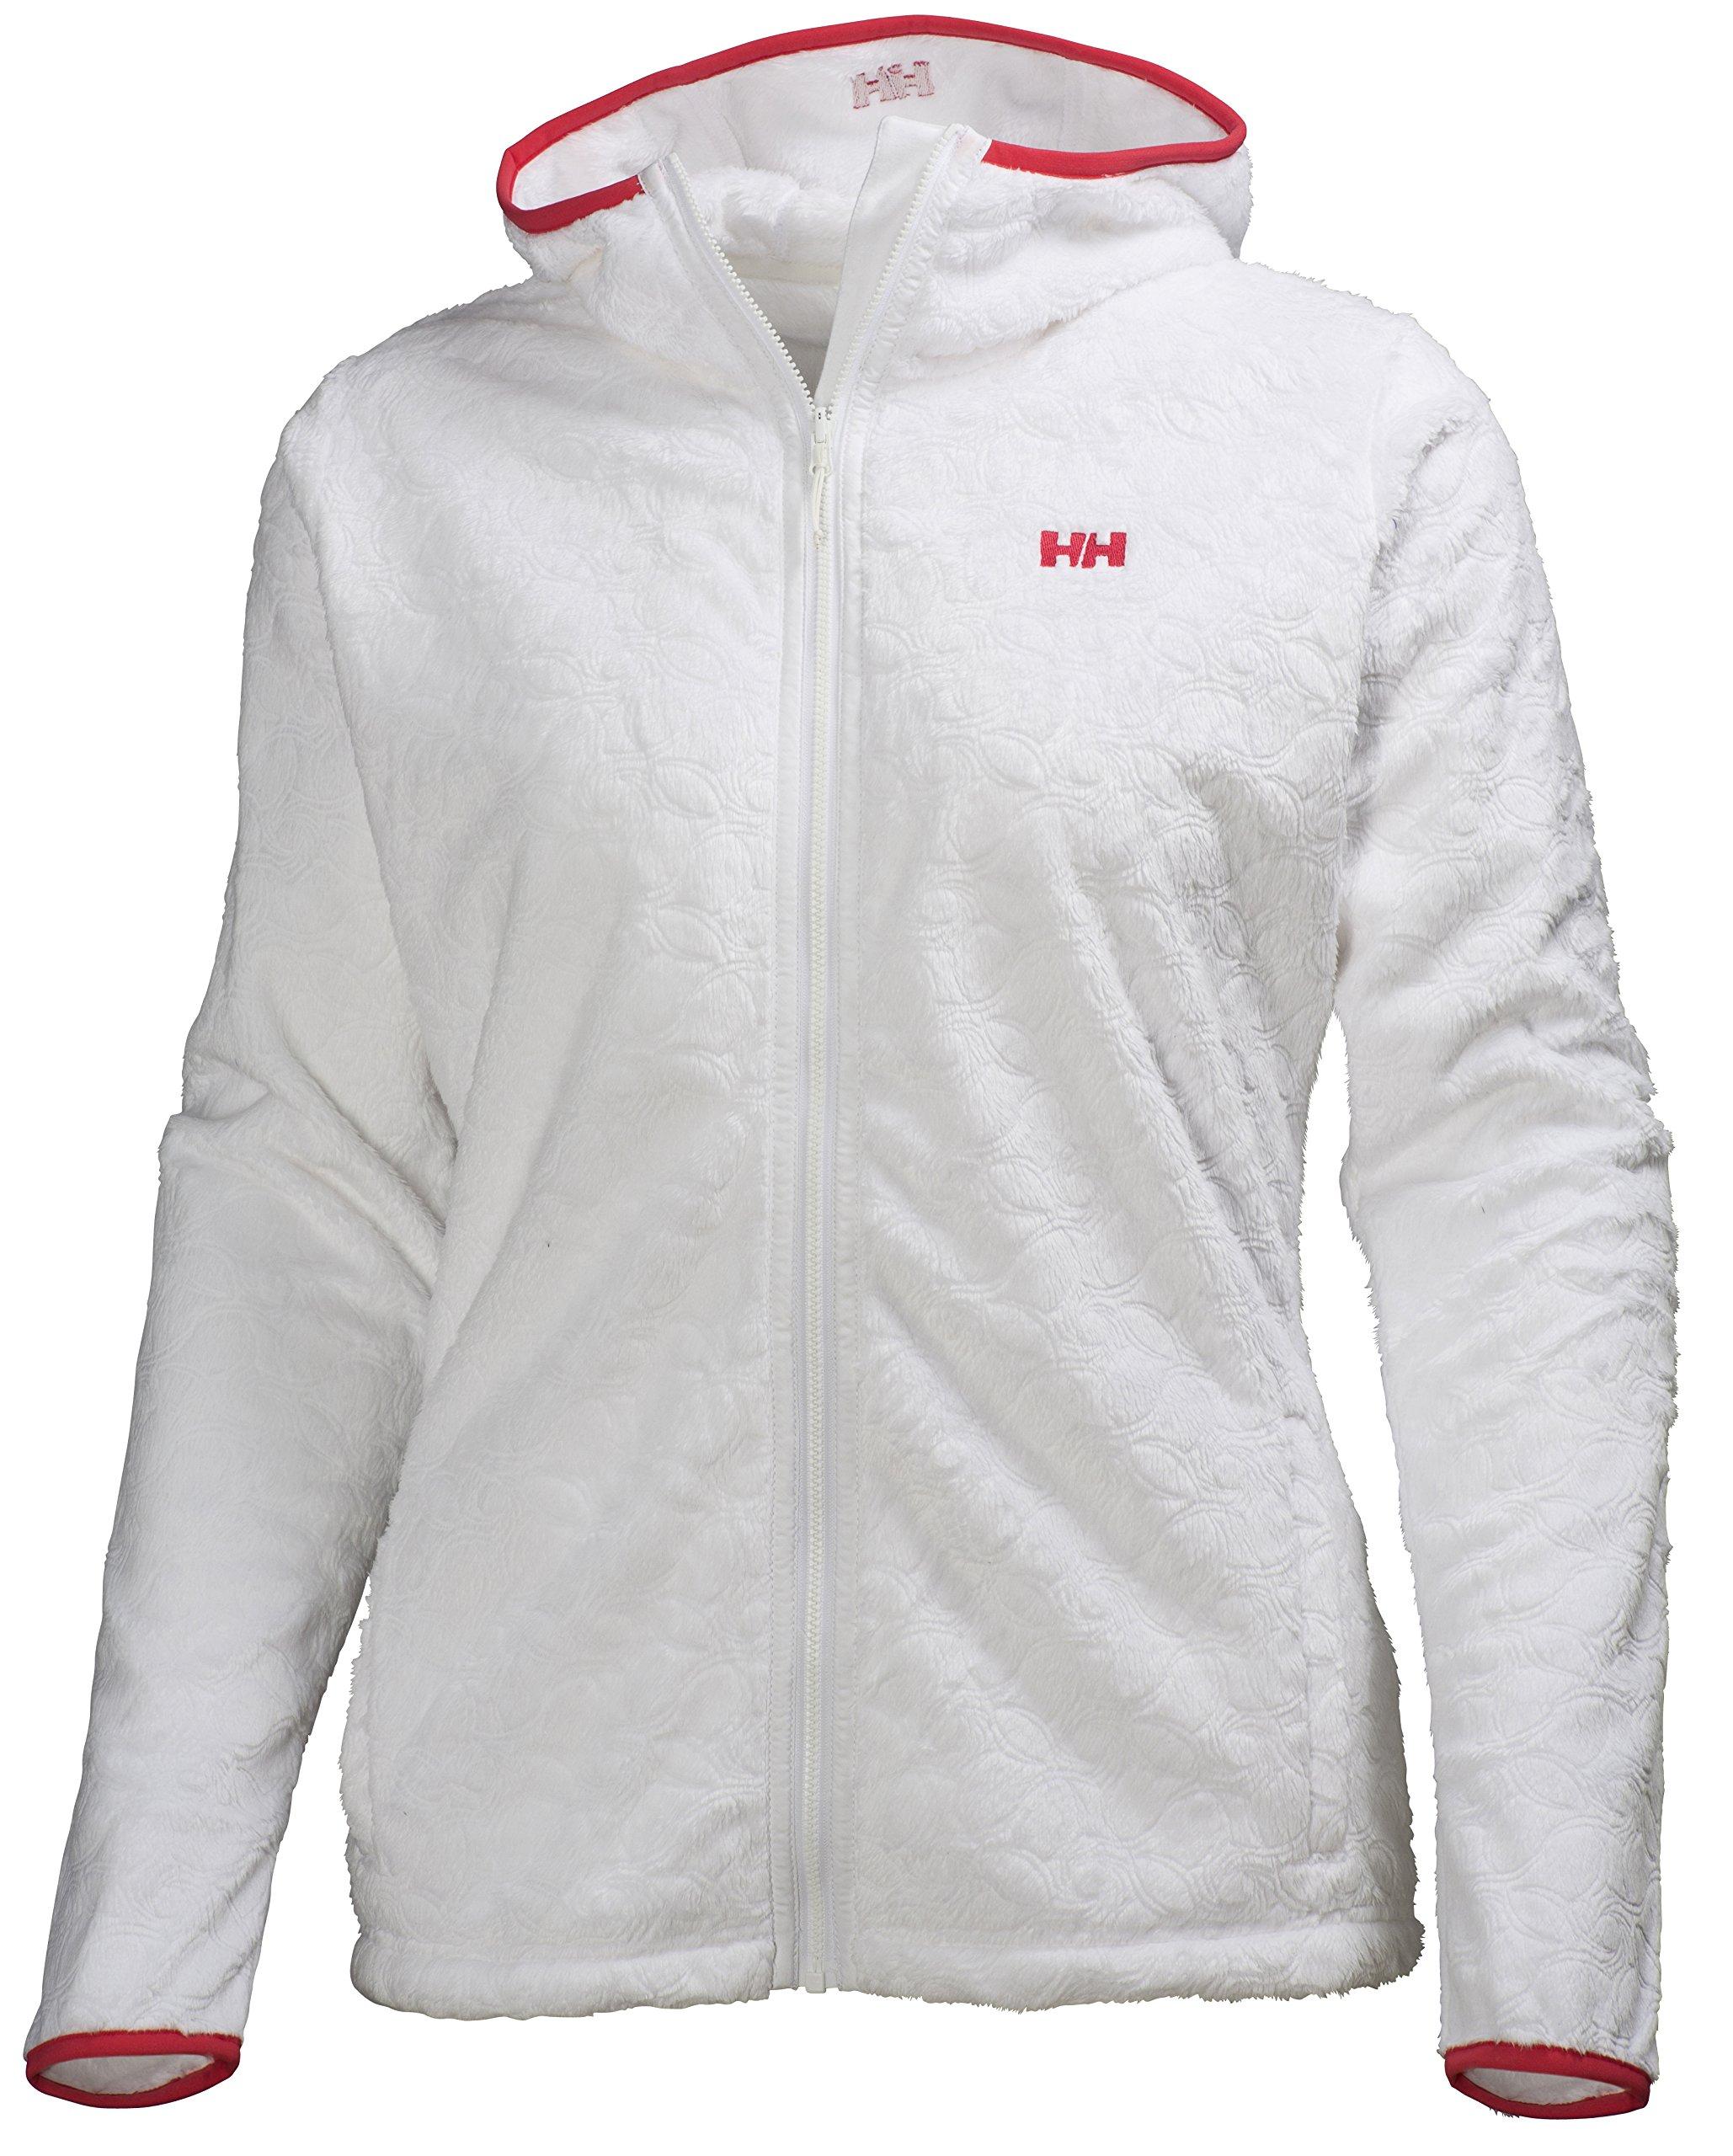 Helly Hansen Women's Precious Fleece Jacket